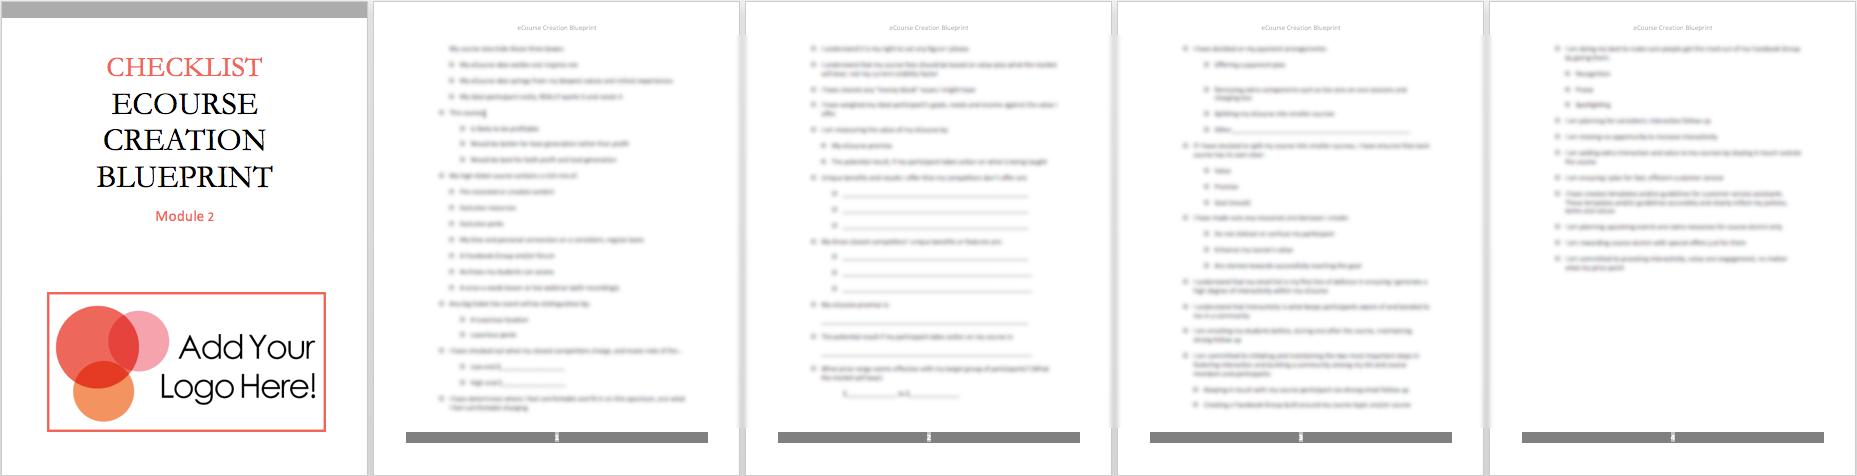 mod-2-checklist